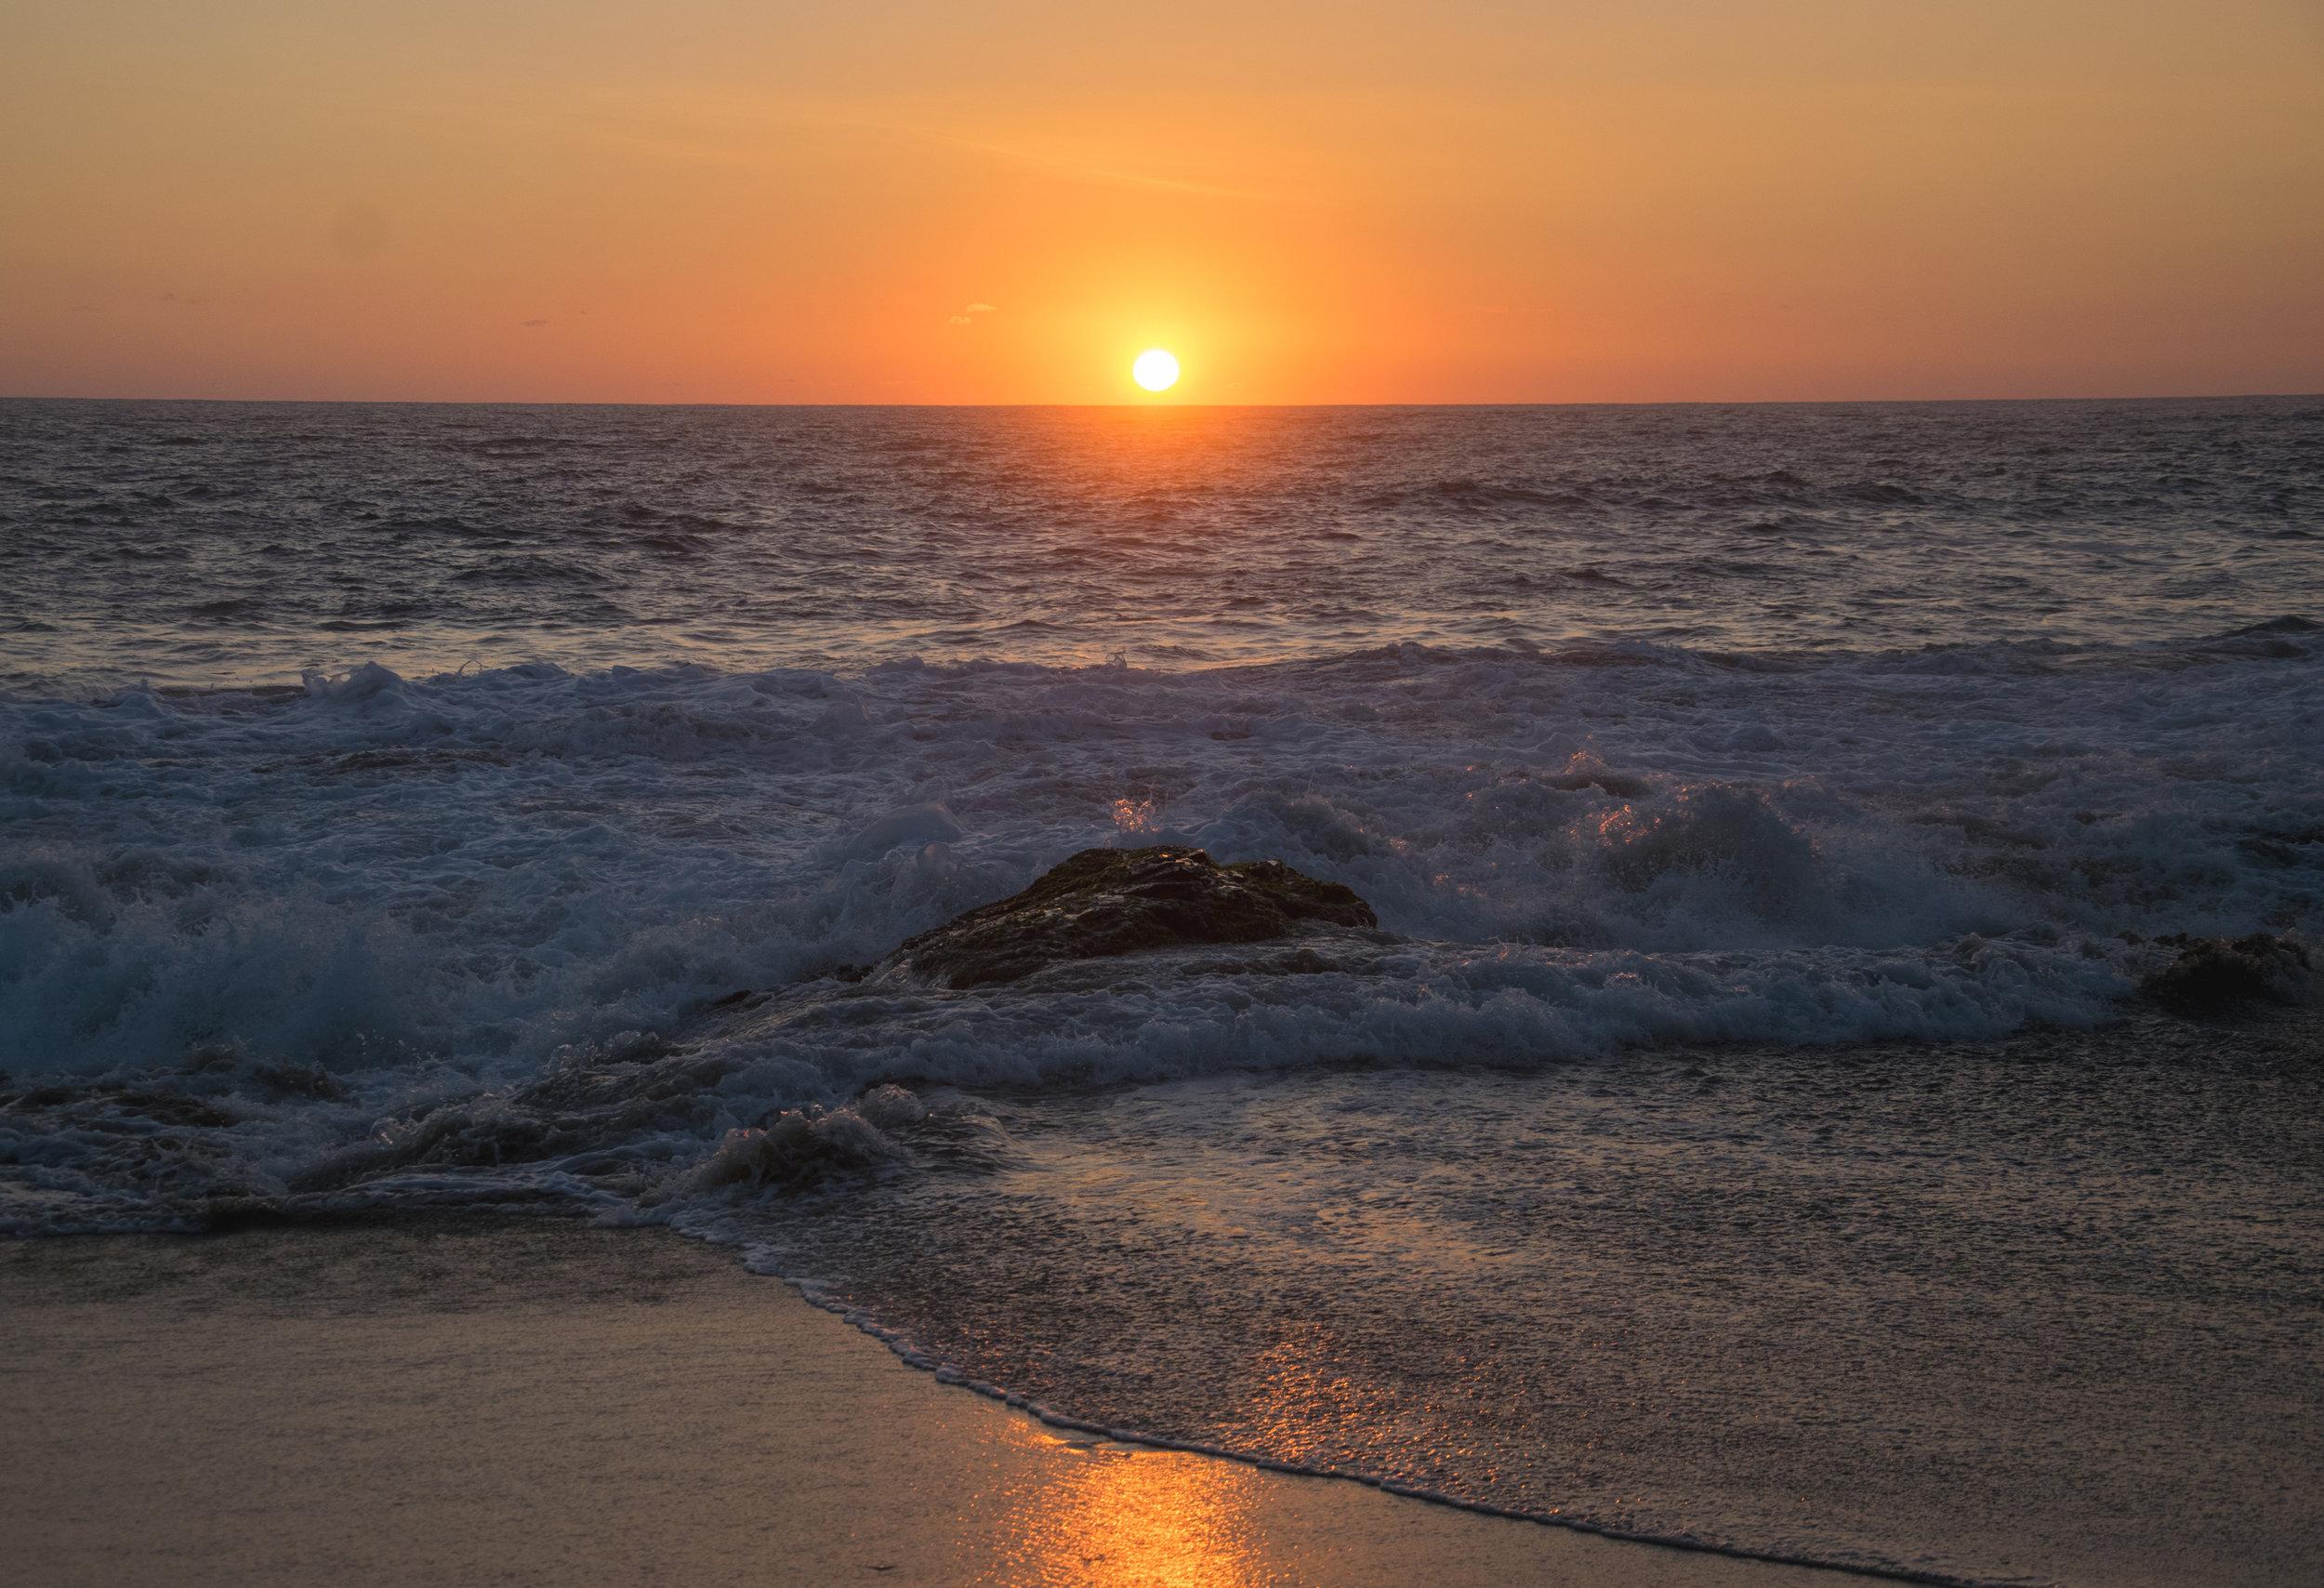 sunset-oaxaca-punta-cometa.jpg